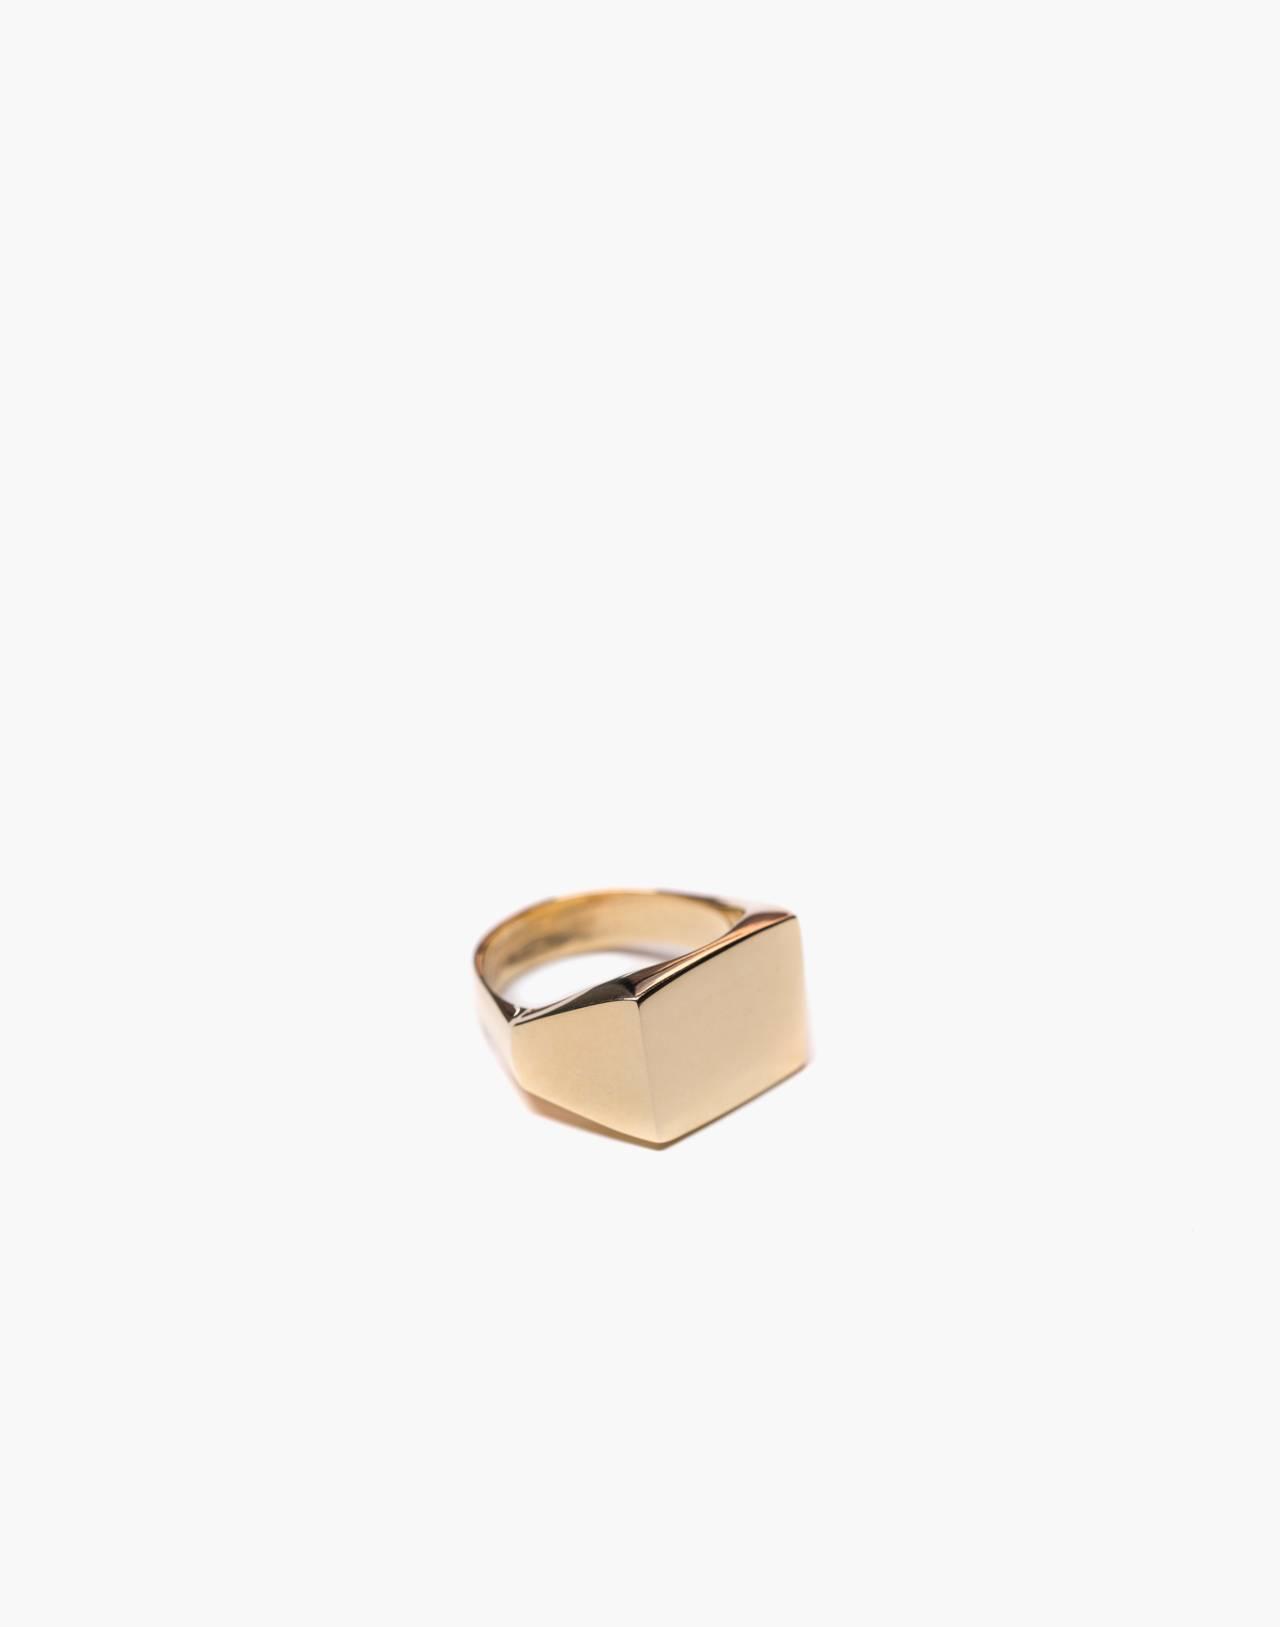 Charlotte Cauwe Studio Brass Delicate Signet Ring in gold image 1